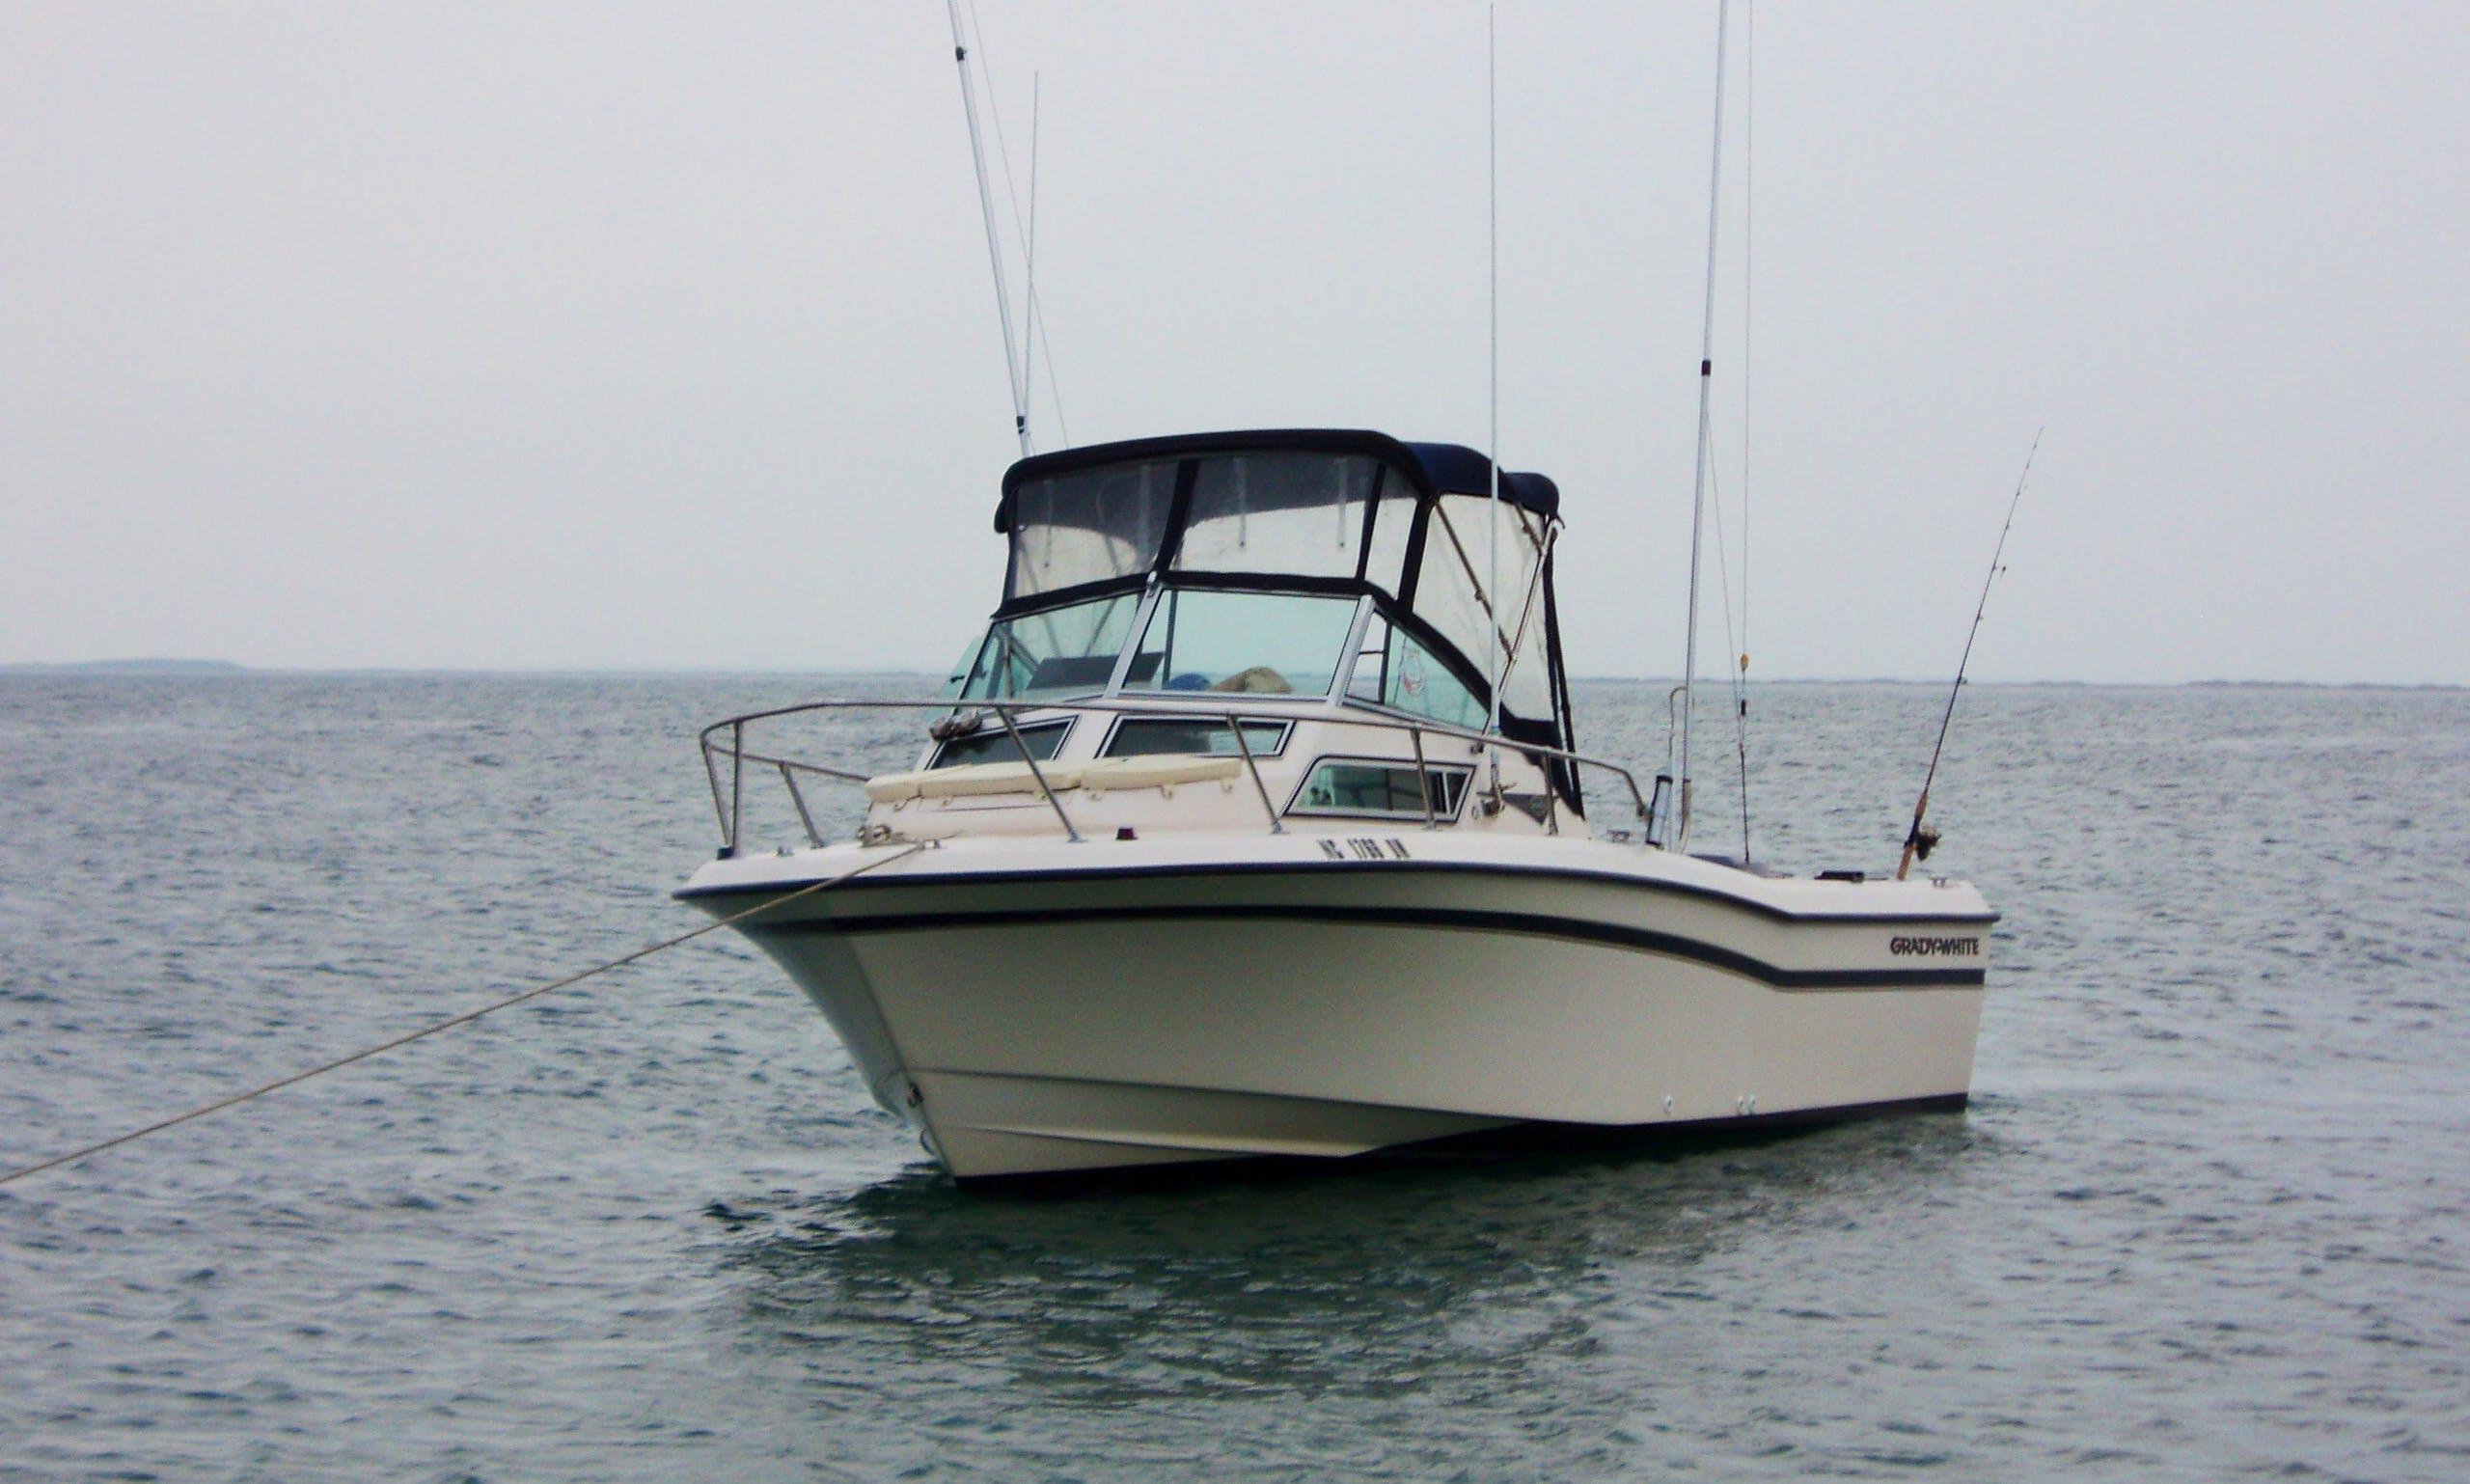 22' Grady White Fishing Boat In Mount Pleasant, South Carolina United States